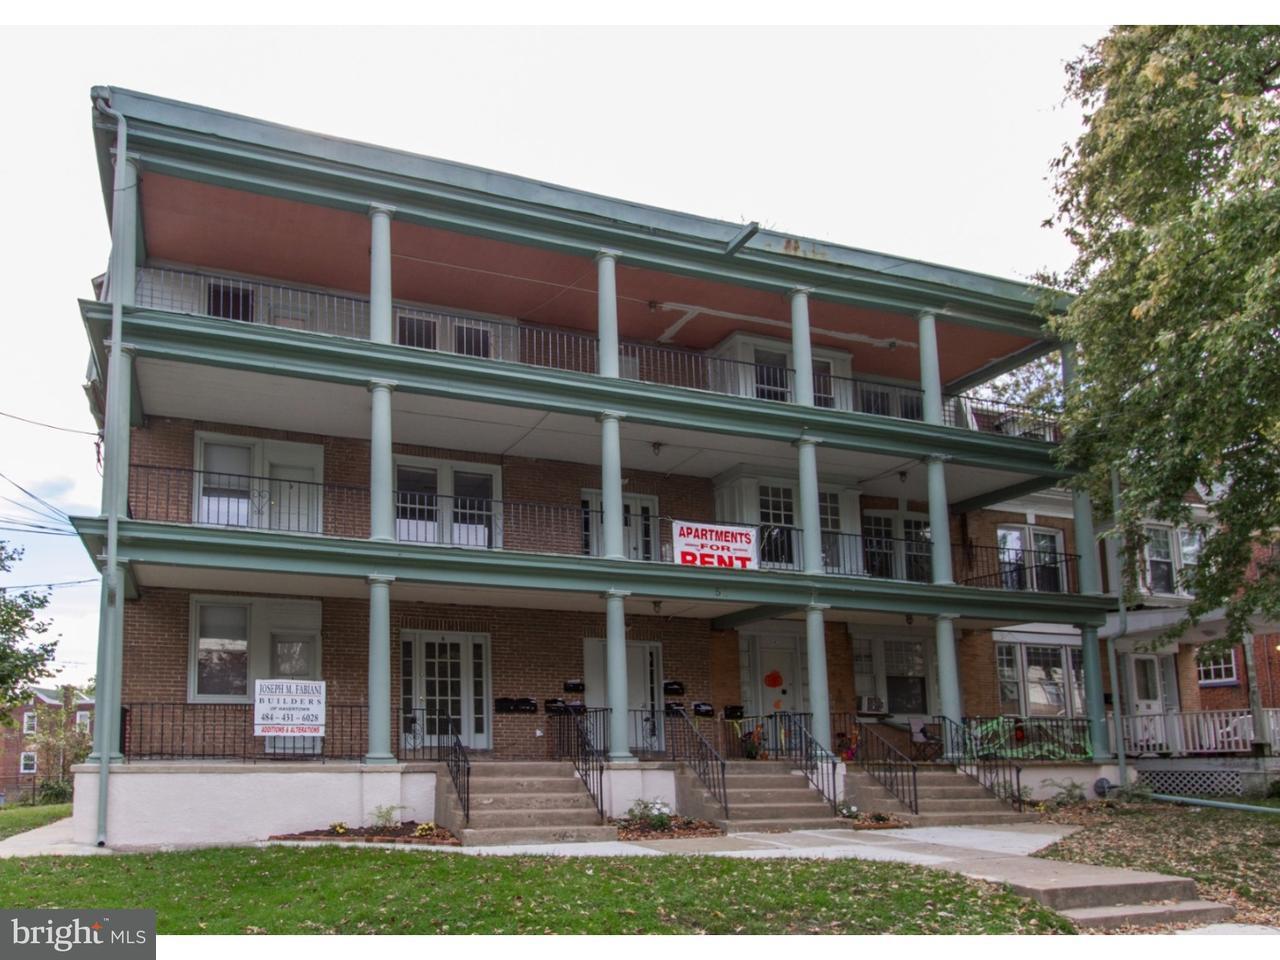 Single Family Home for Rent at 52-54 E STRATFORD AVE #H Lansdowne, Pennsylvania 19050 United States